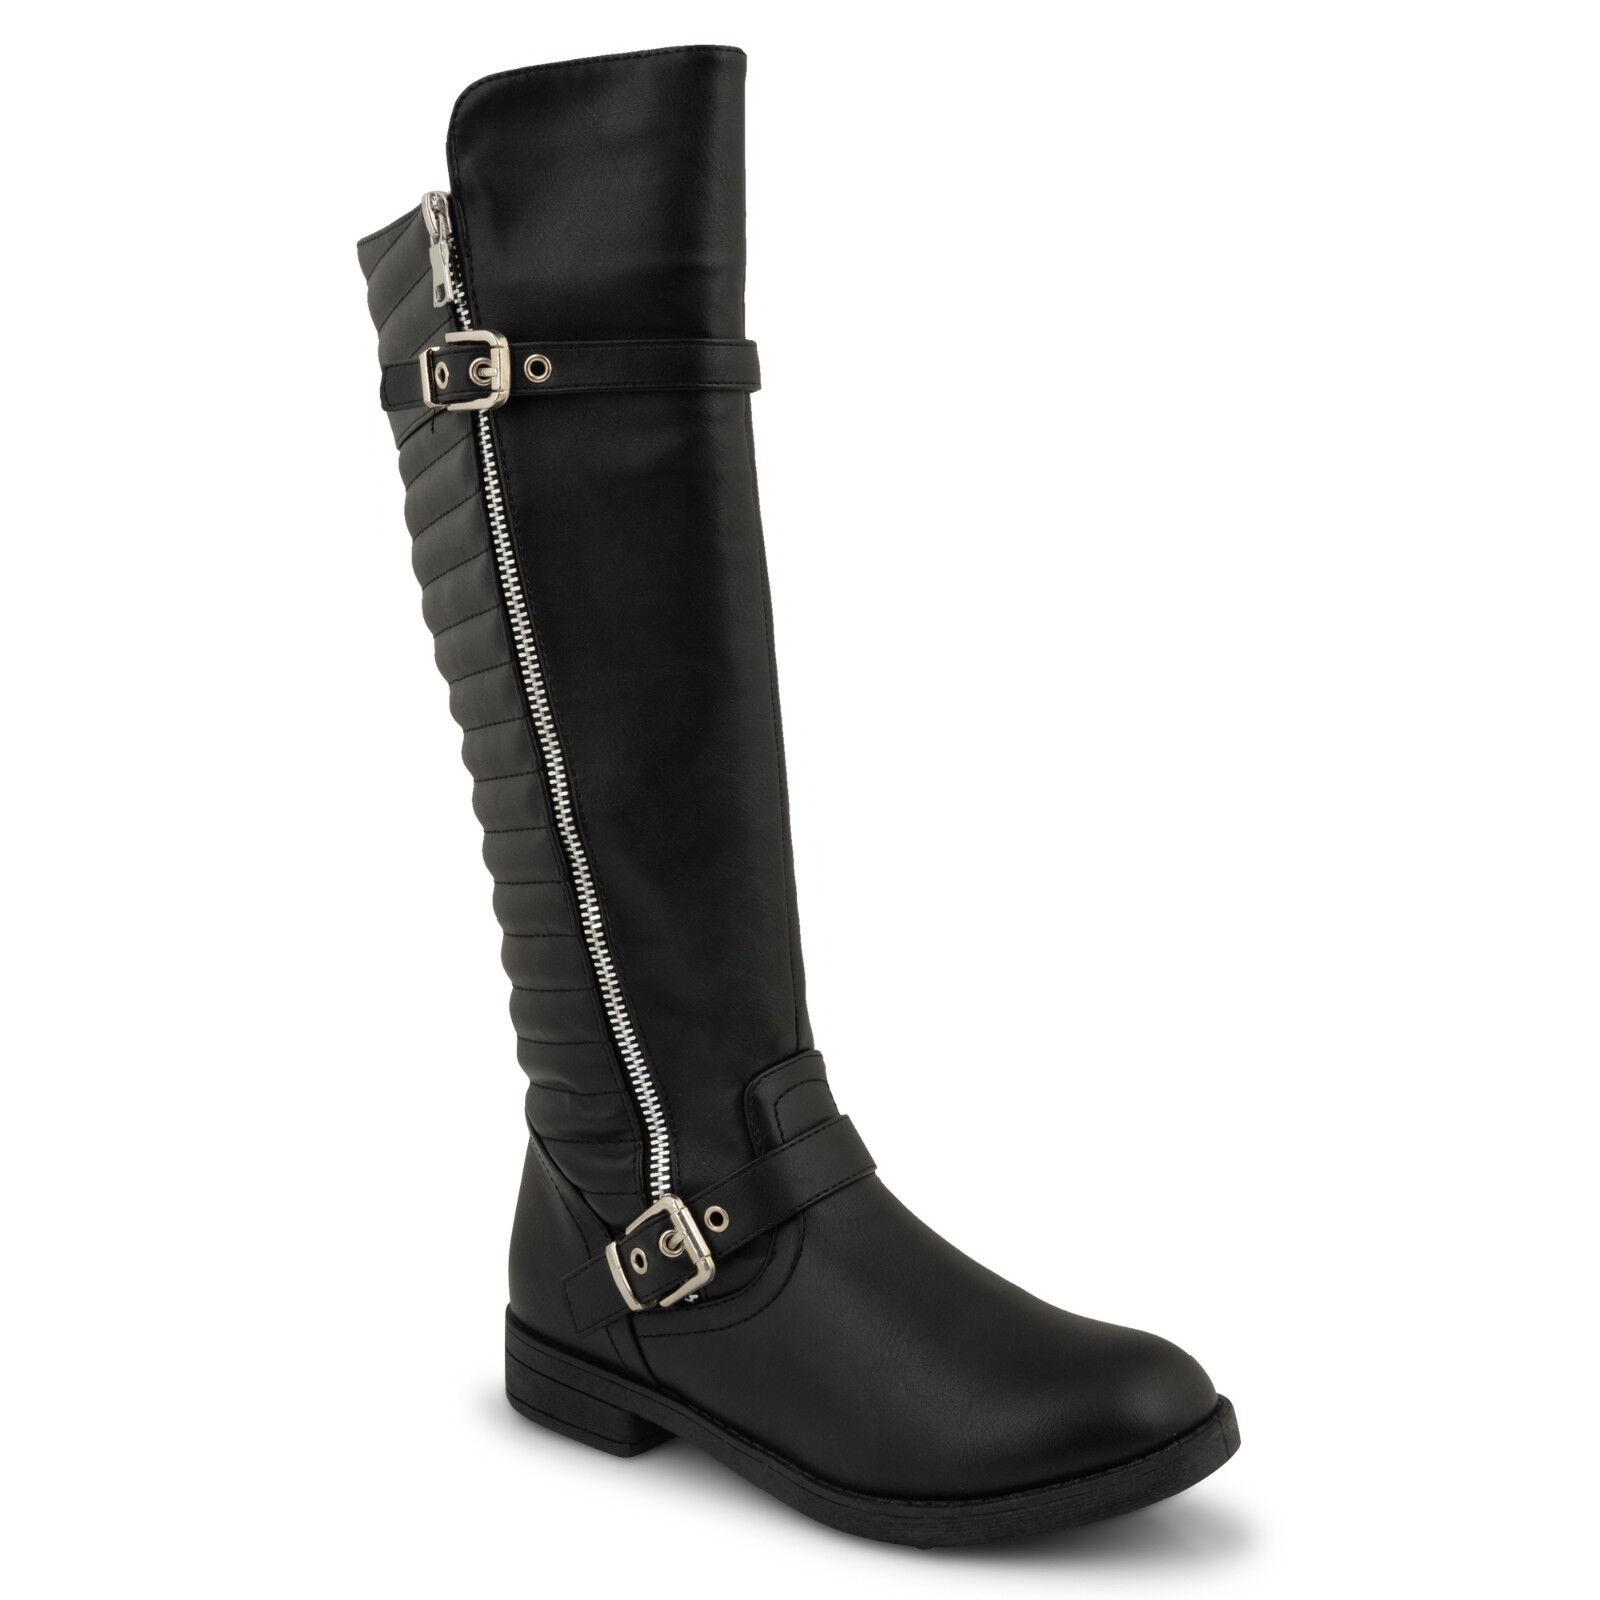 Over the Knee Boots Buckle Zip Closure Flat Low Heel Winter Leather Shoes Women